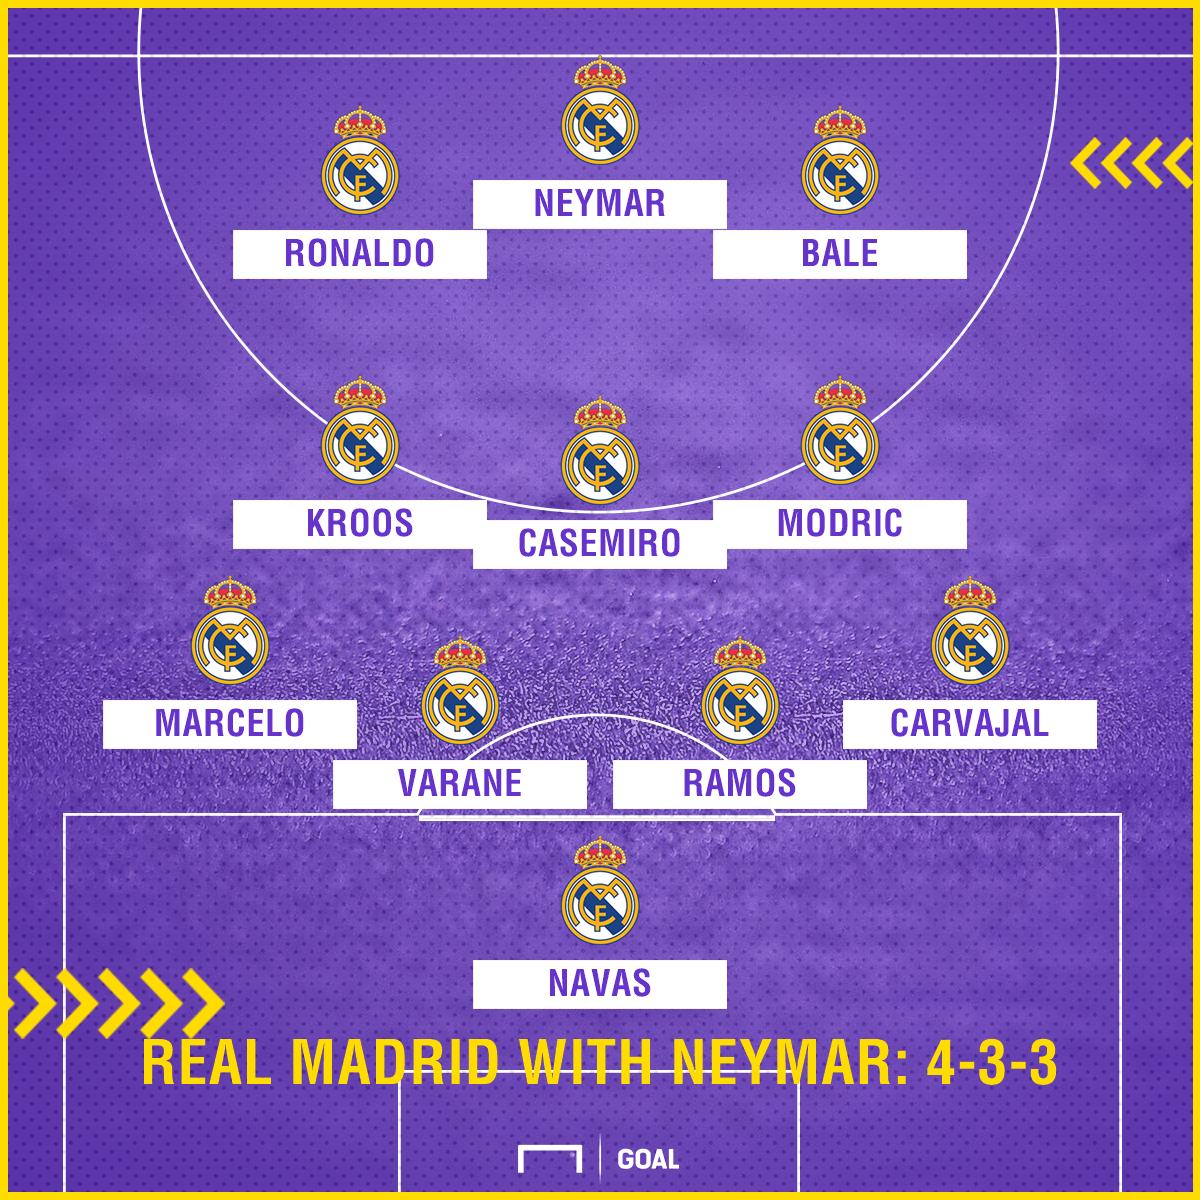 Real Madrid with Neymar 4-3-3